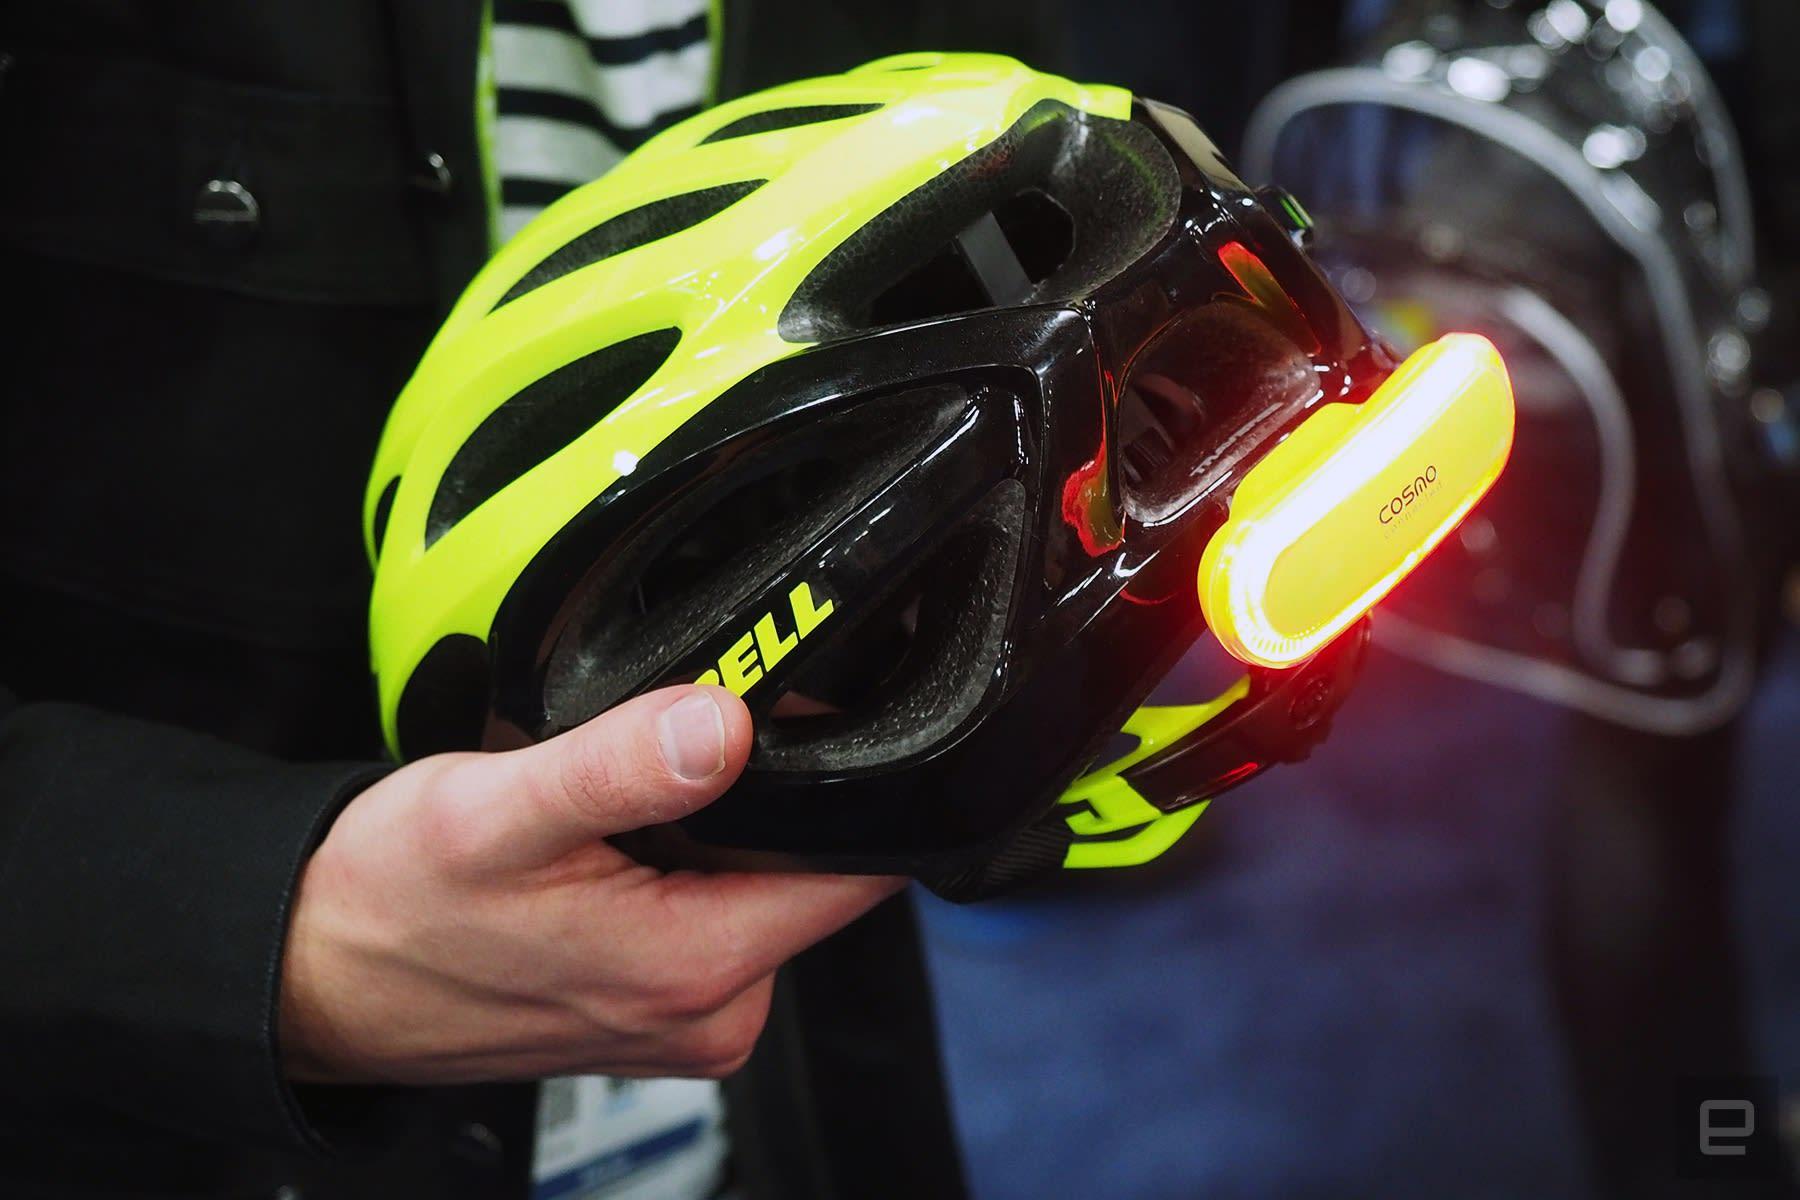 Bike Helmet Light >> Cosmo S Bike Helmet Light Will Alert Others When You Fall